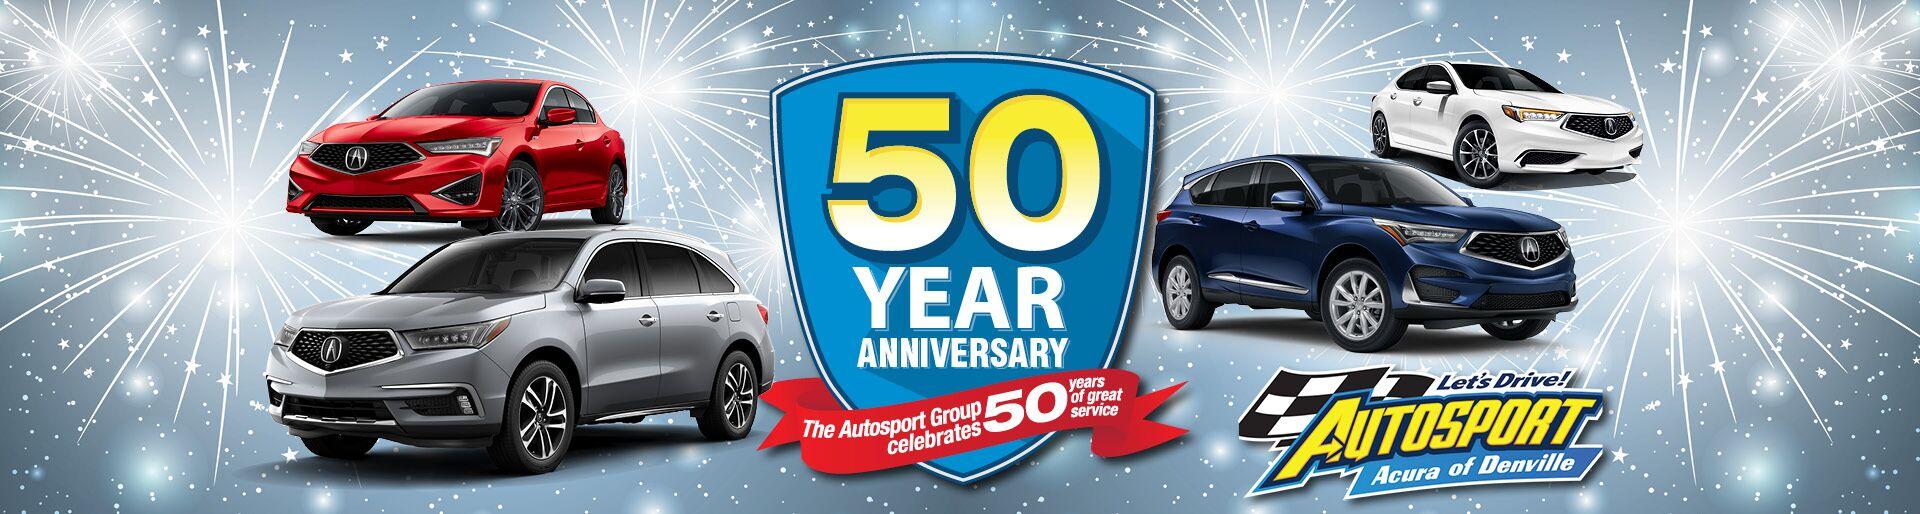 Acura Dealer Locator >> Acura Dealership Denville Nj Pre Owned Cars Autosport Acura Of